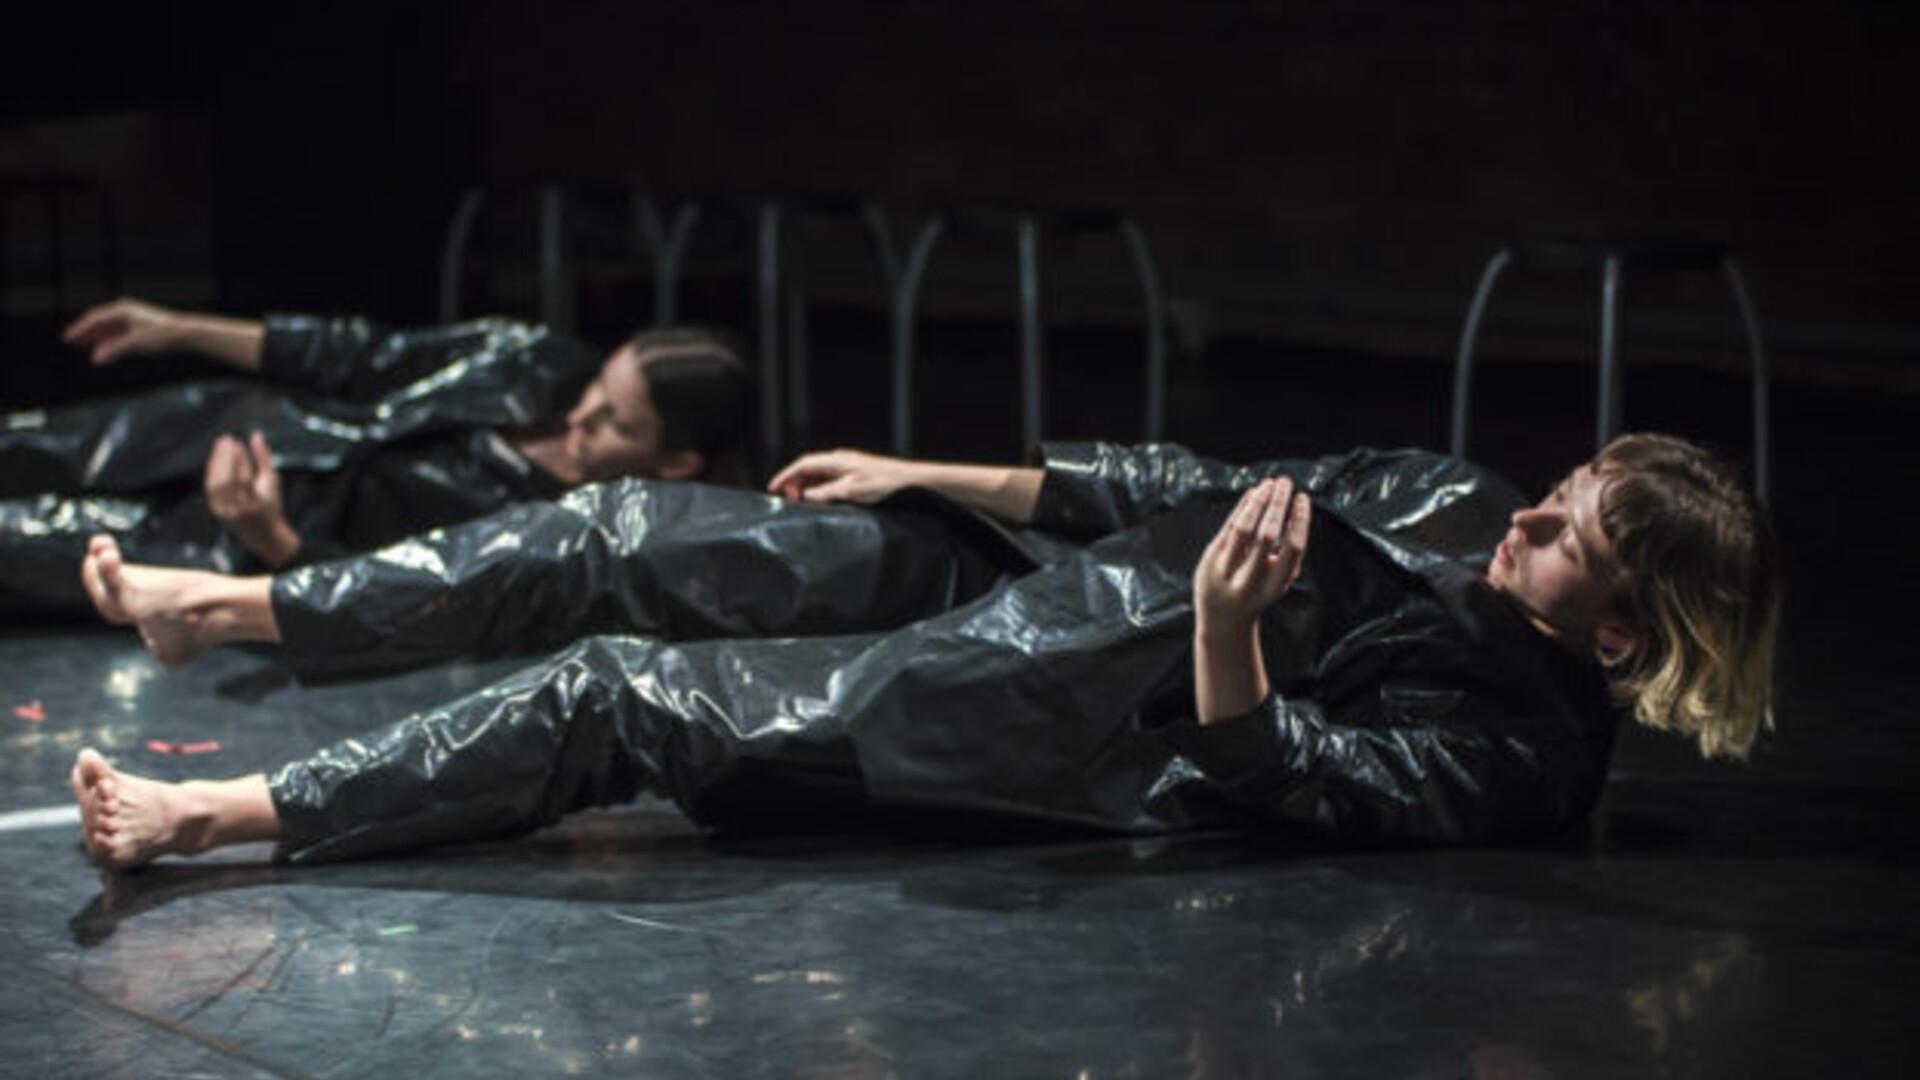 Two dancers lie on their backs, their necks craning upward.